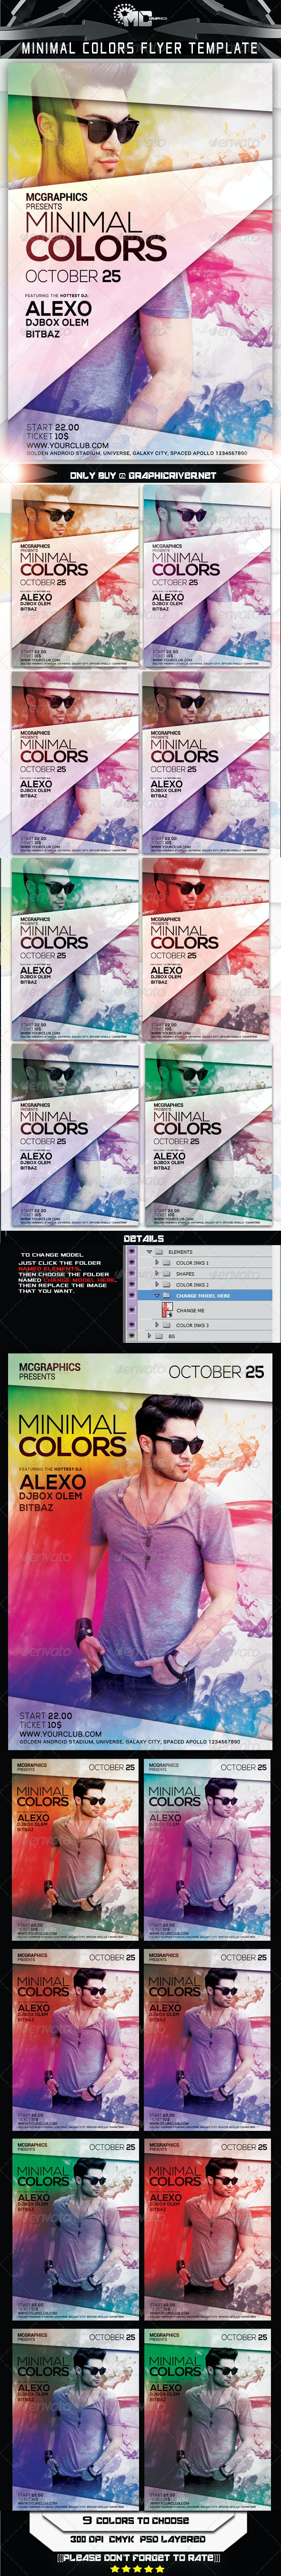 Minimal Colors Flyer Template - Flyers Print Templates